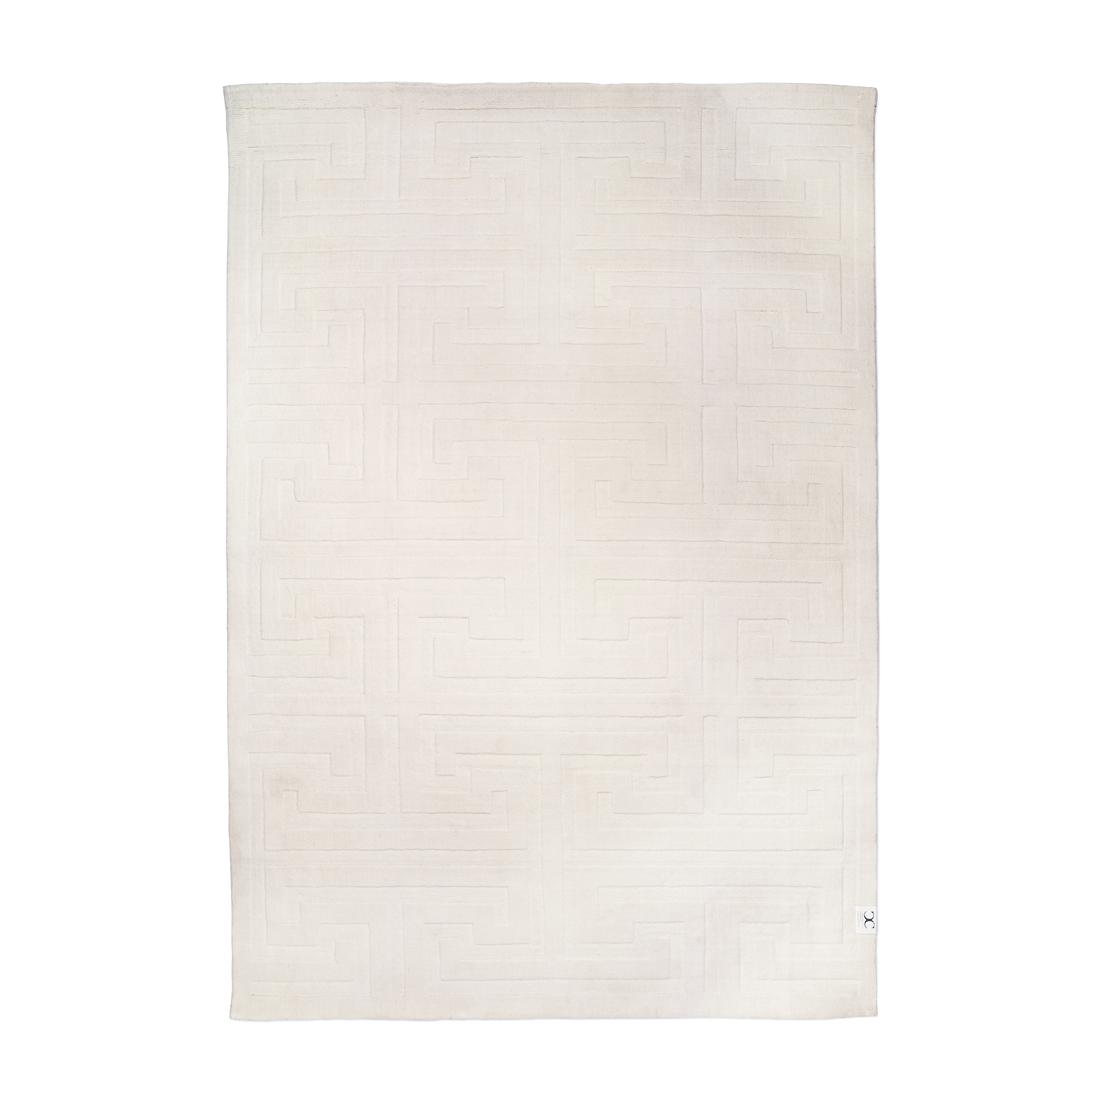 Vit ullmatta KEY WOOL 170 x 230 cm, Classic Collection